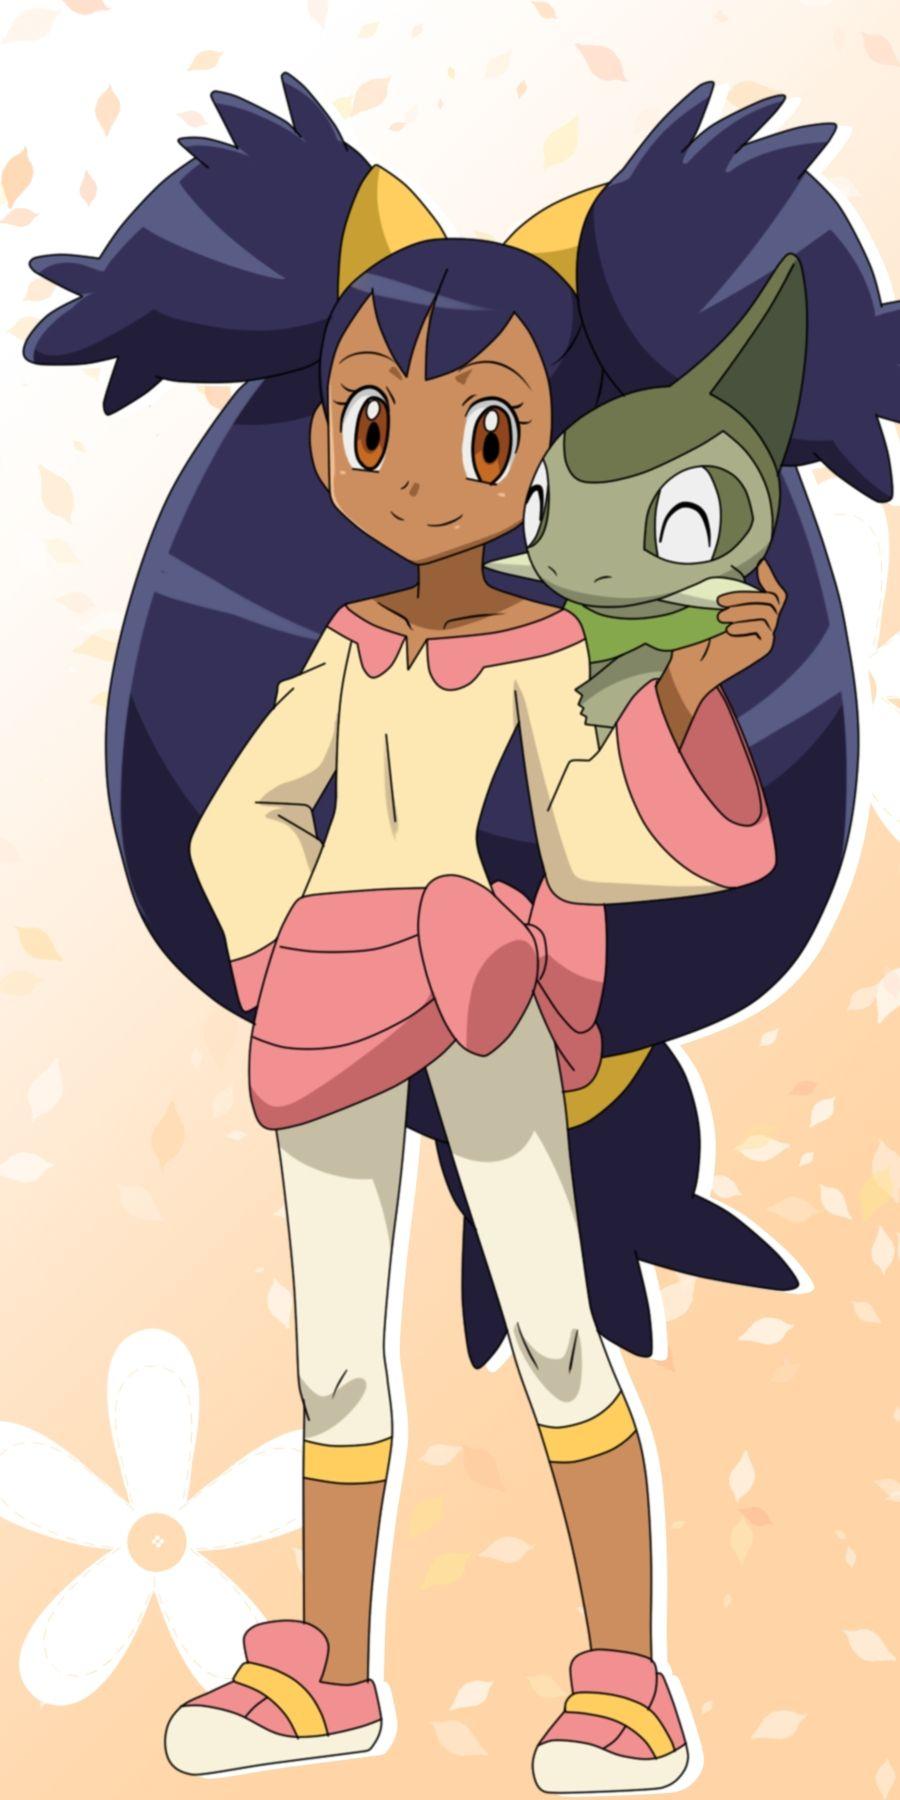 Iris  Axew  Pokemon Iris, Pokemon Characters, Pokemon-4416